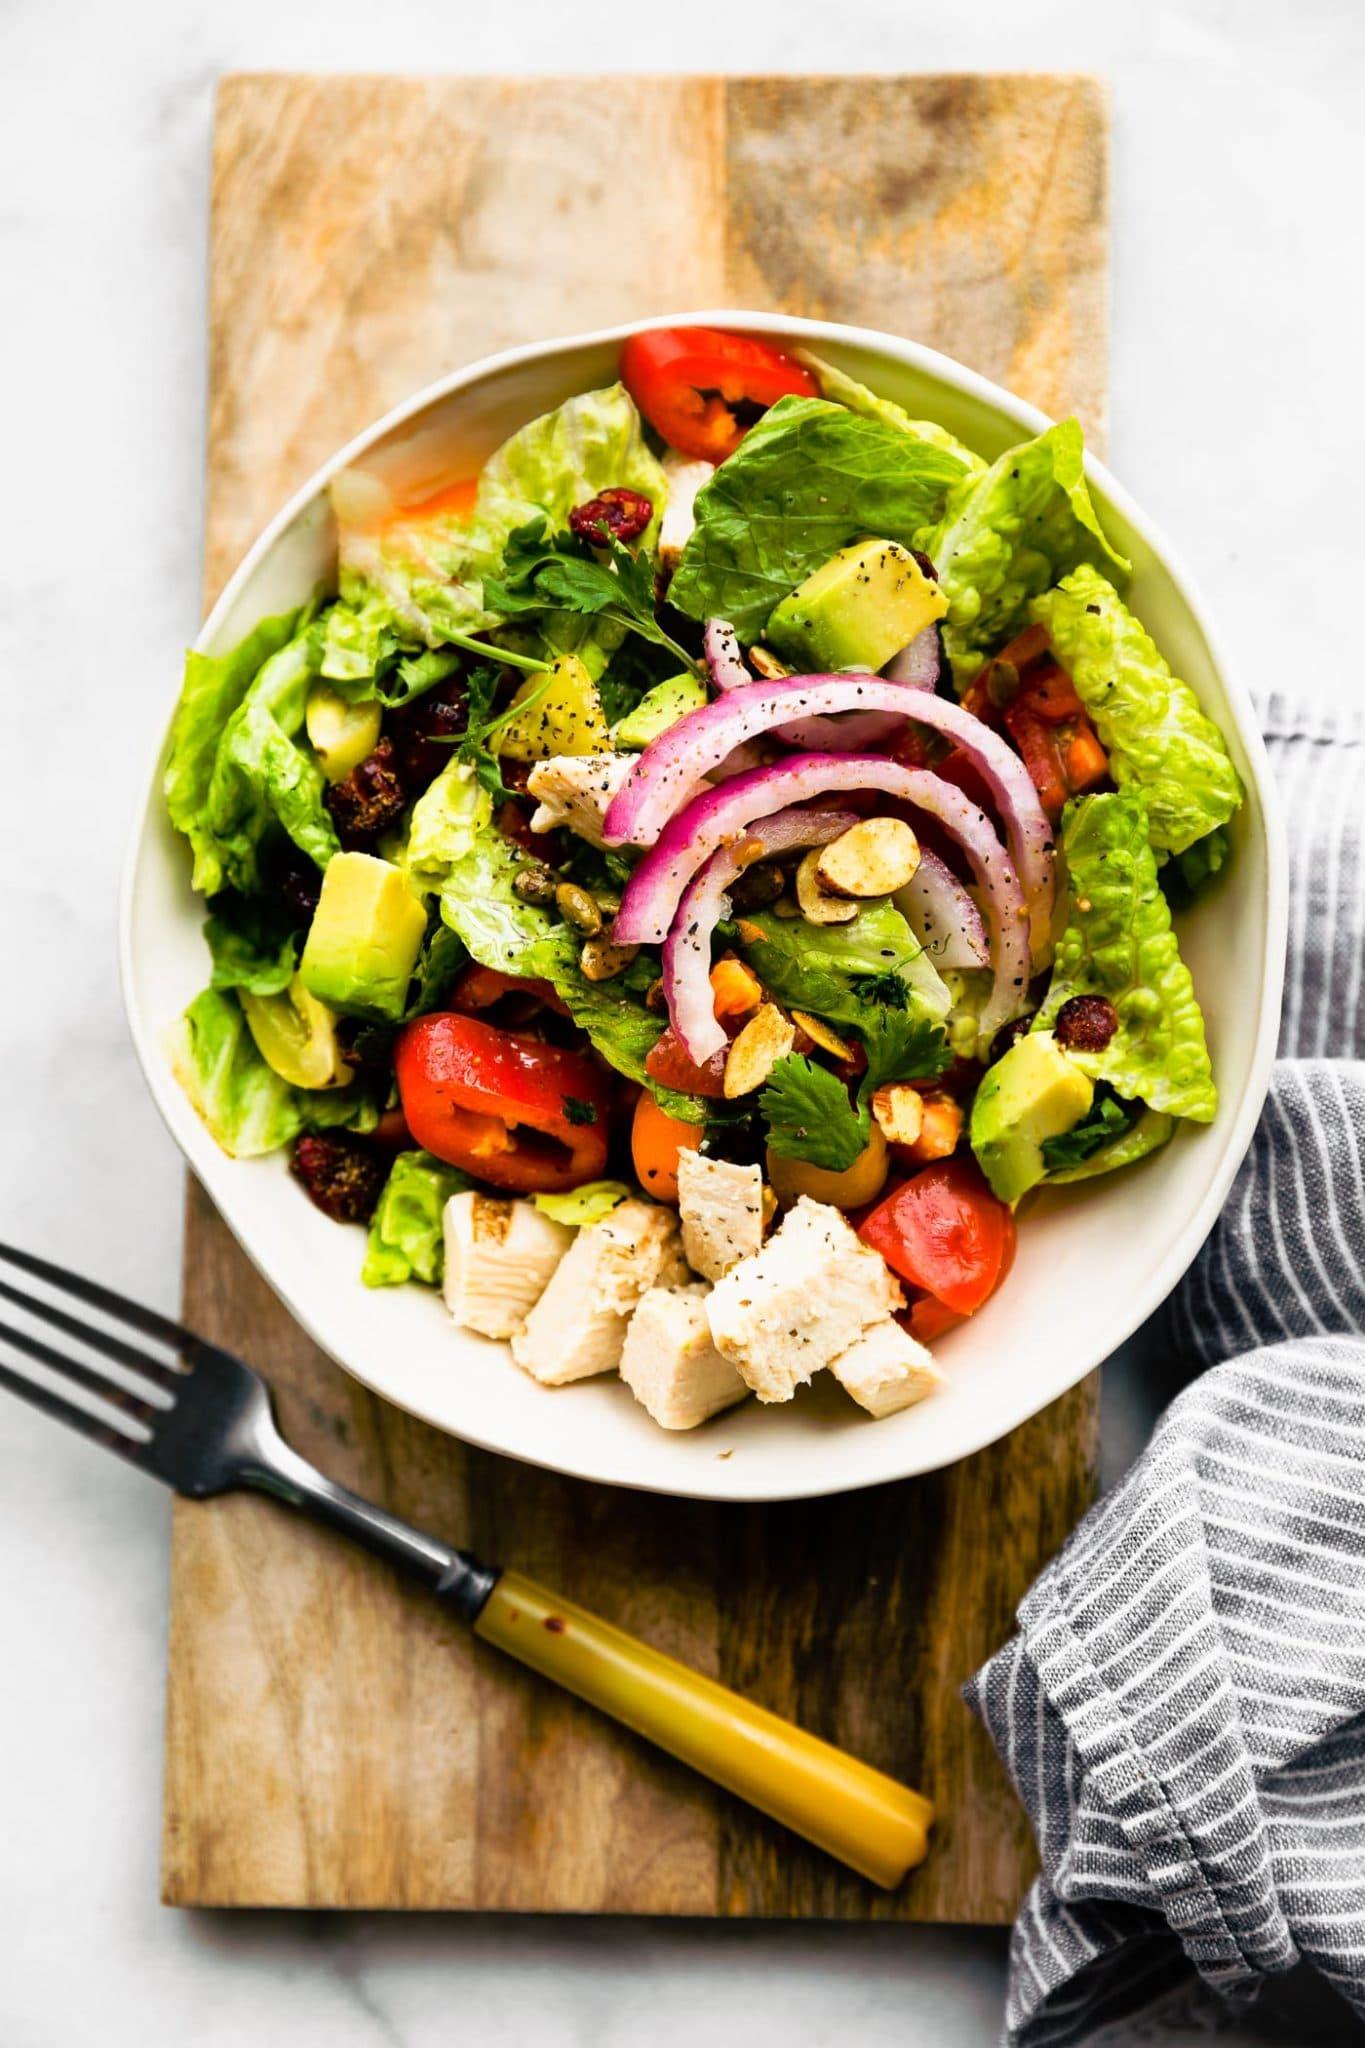 Overhead image of southwest chicken salad on a wooden serving platter.